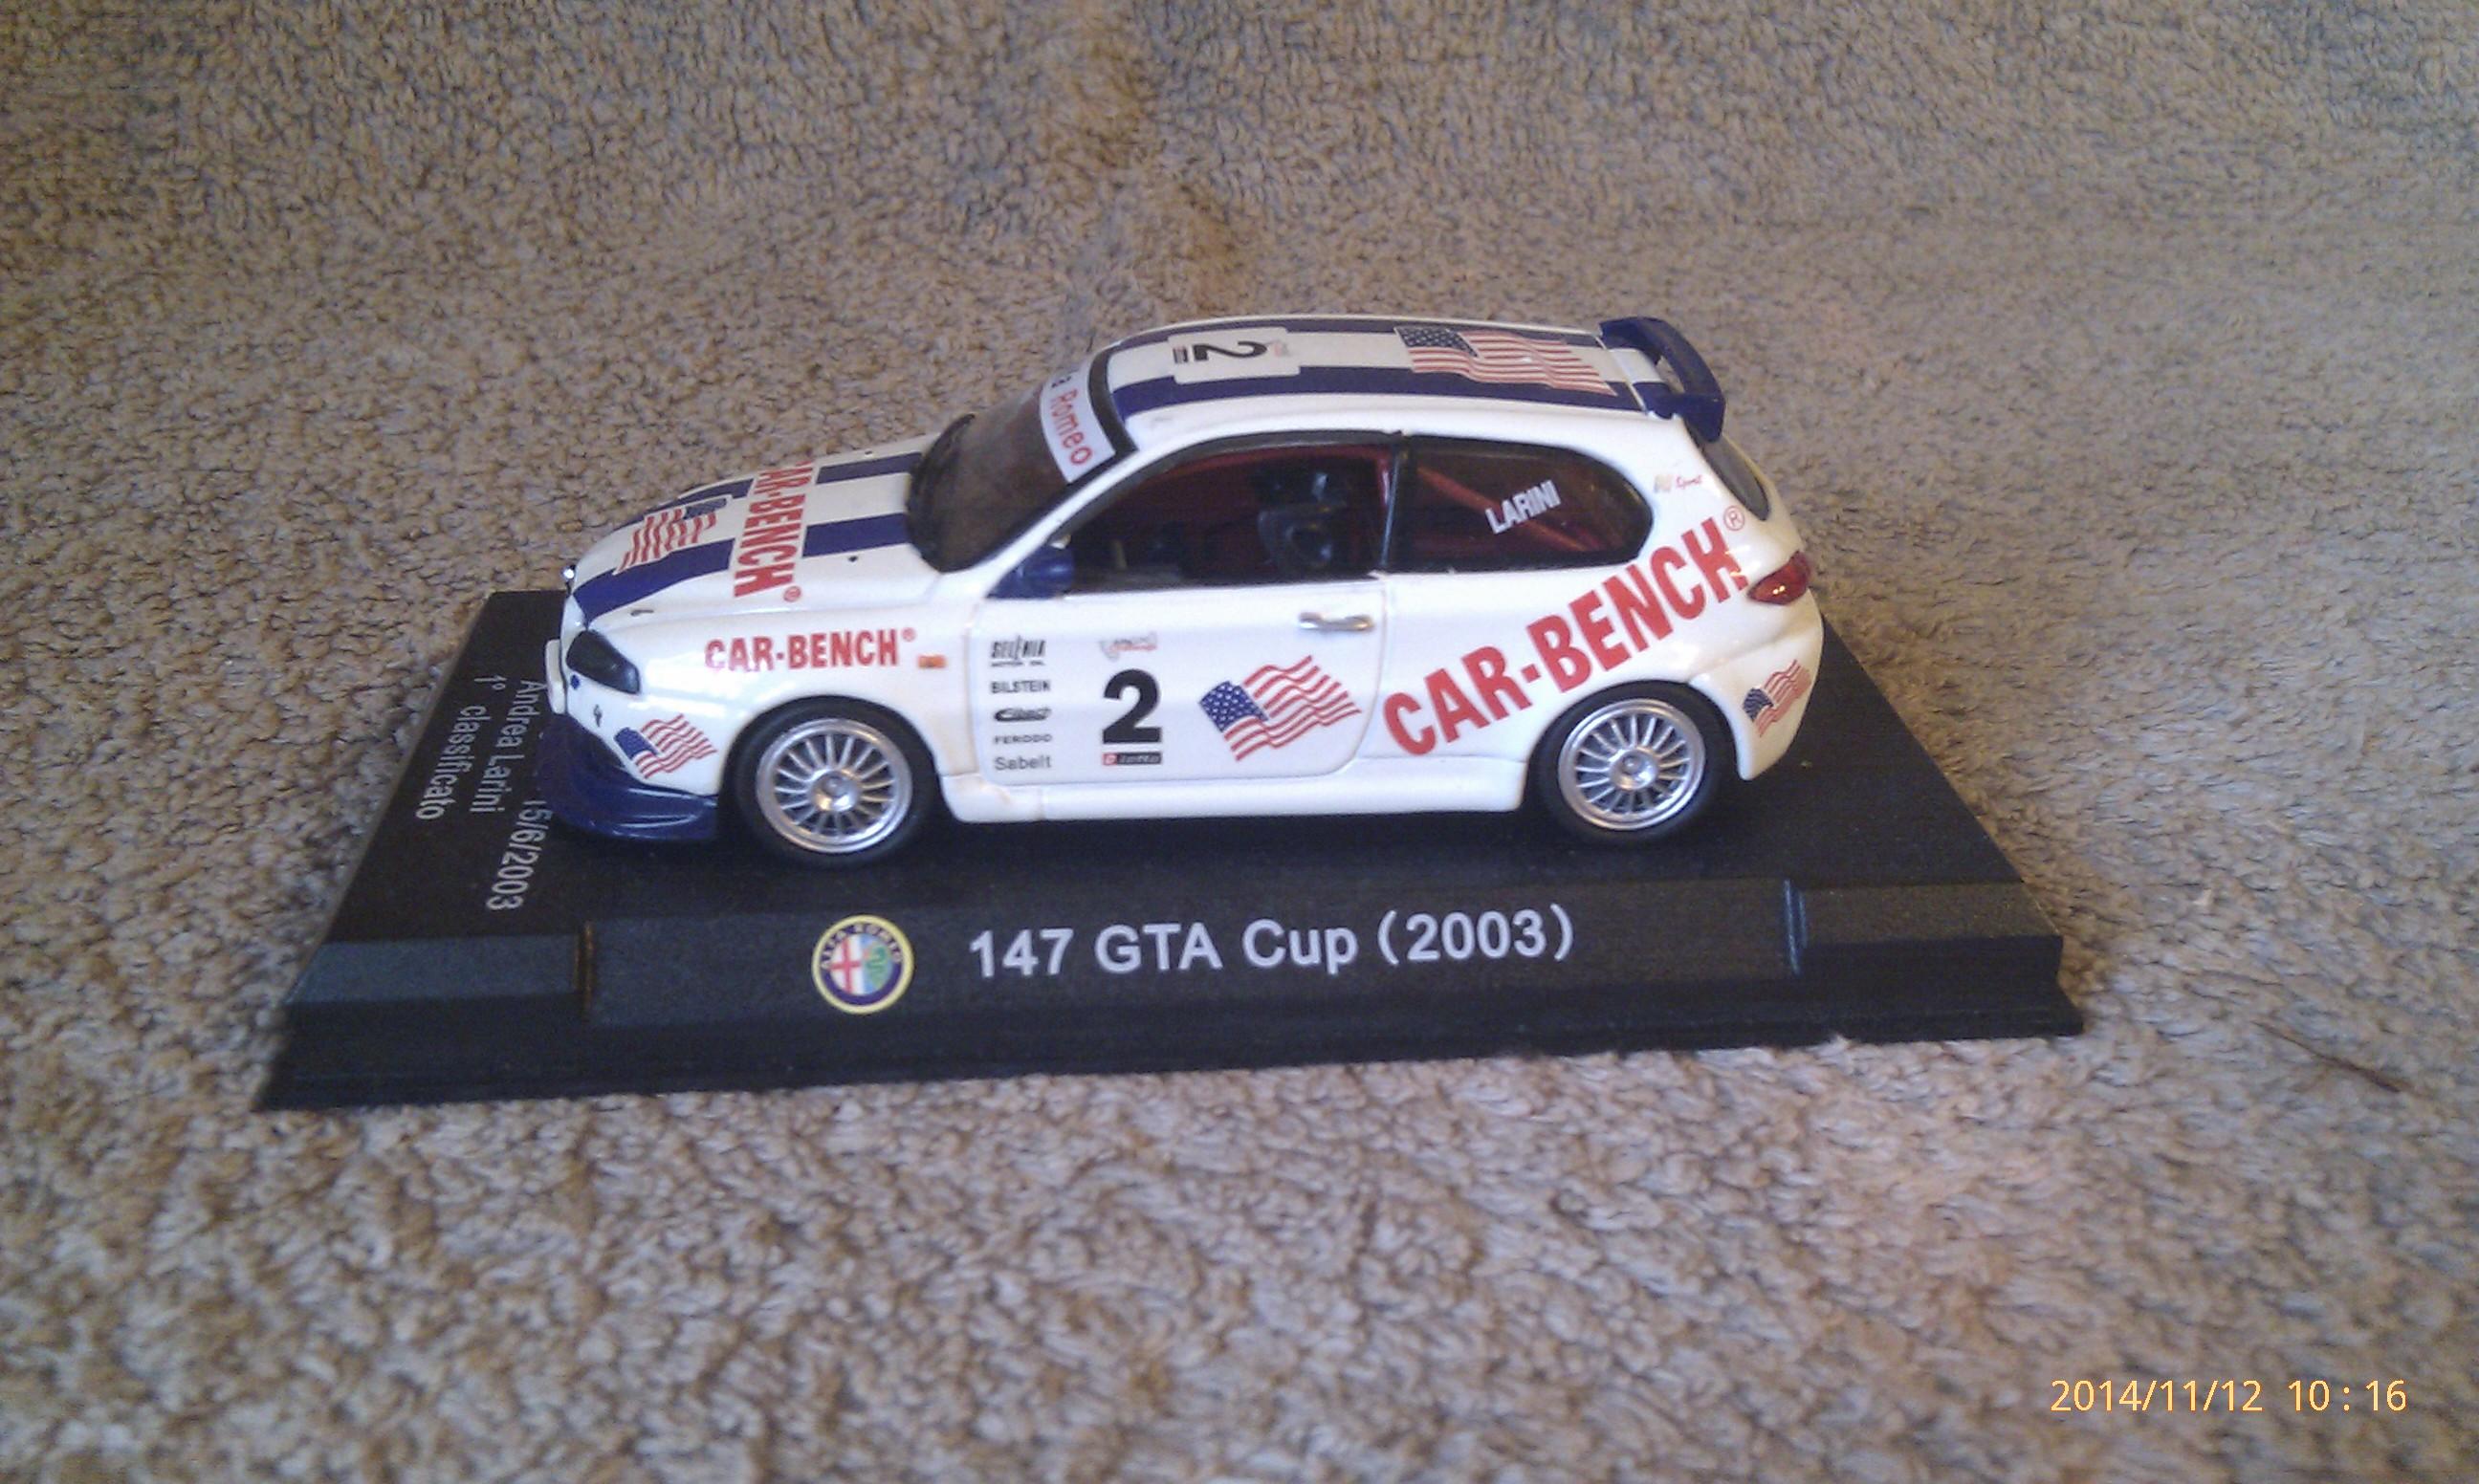 Alfa Romeo 147 GTA Cup 2003